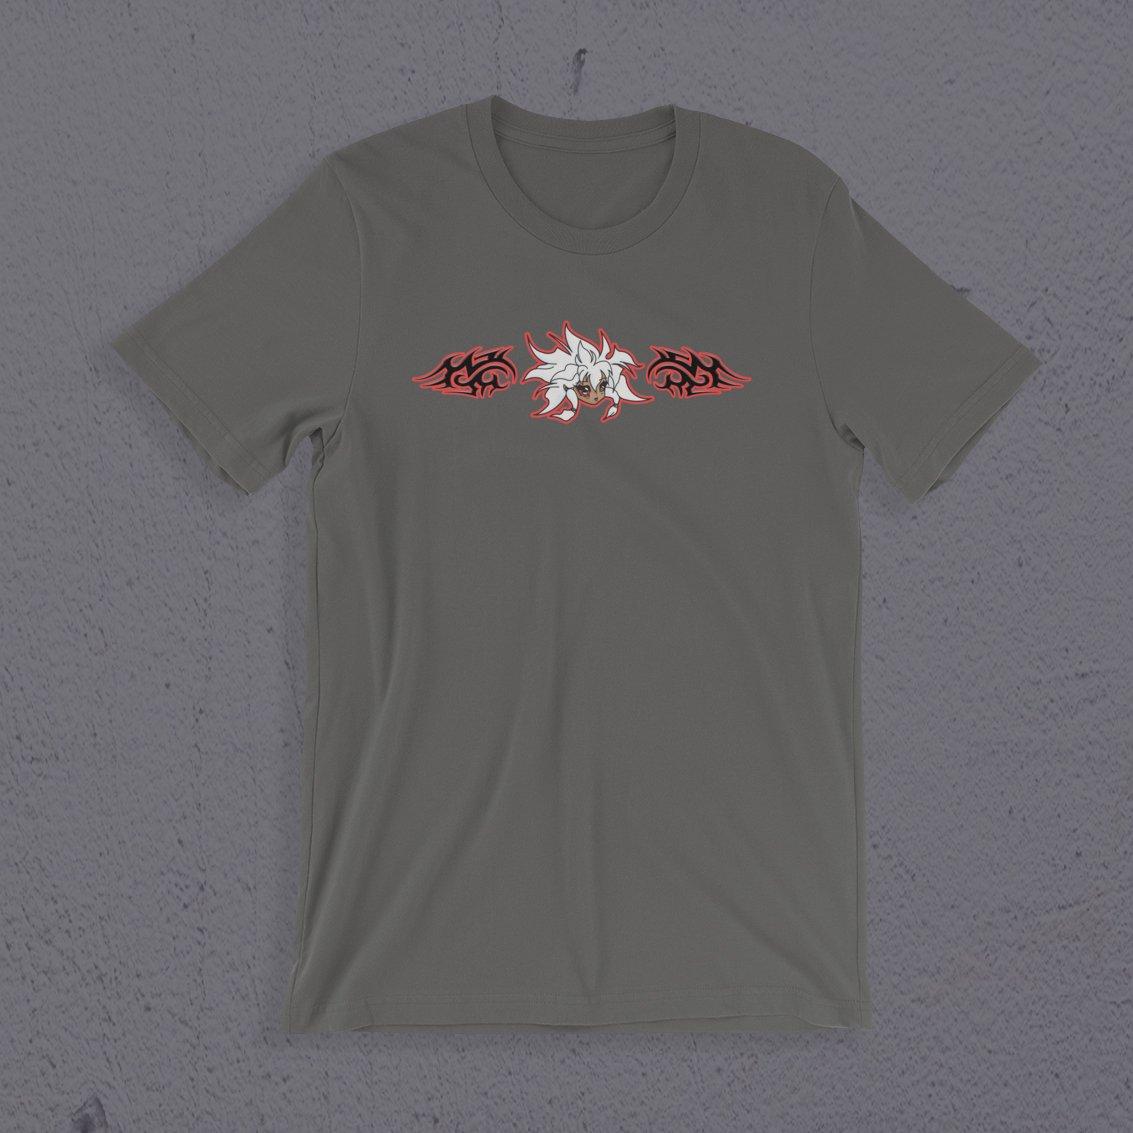 Image of Kickflip T-shirt